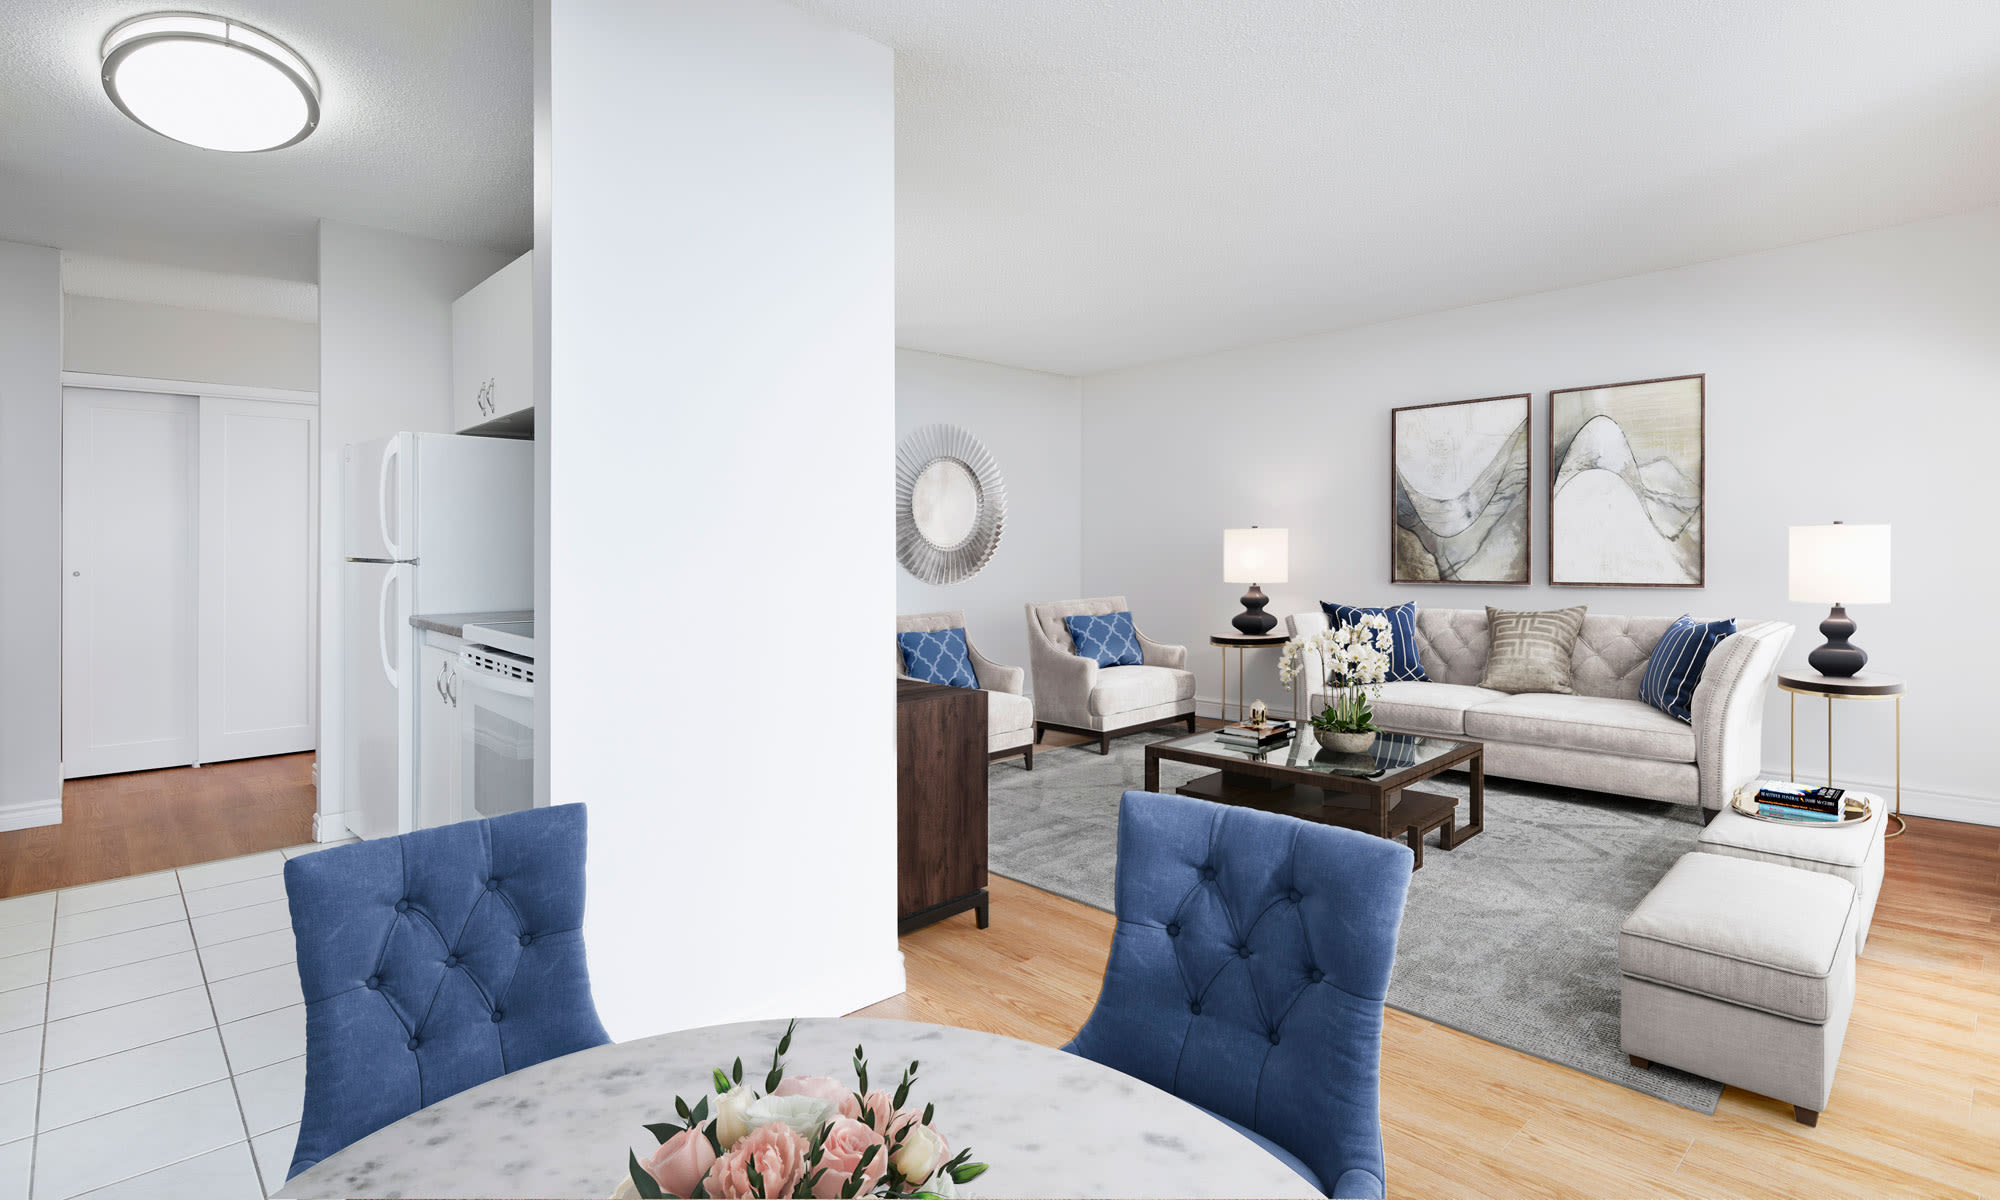 Spring Garden offers a cozy dining room in Halifax, Nova Scotia